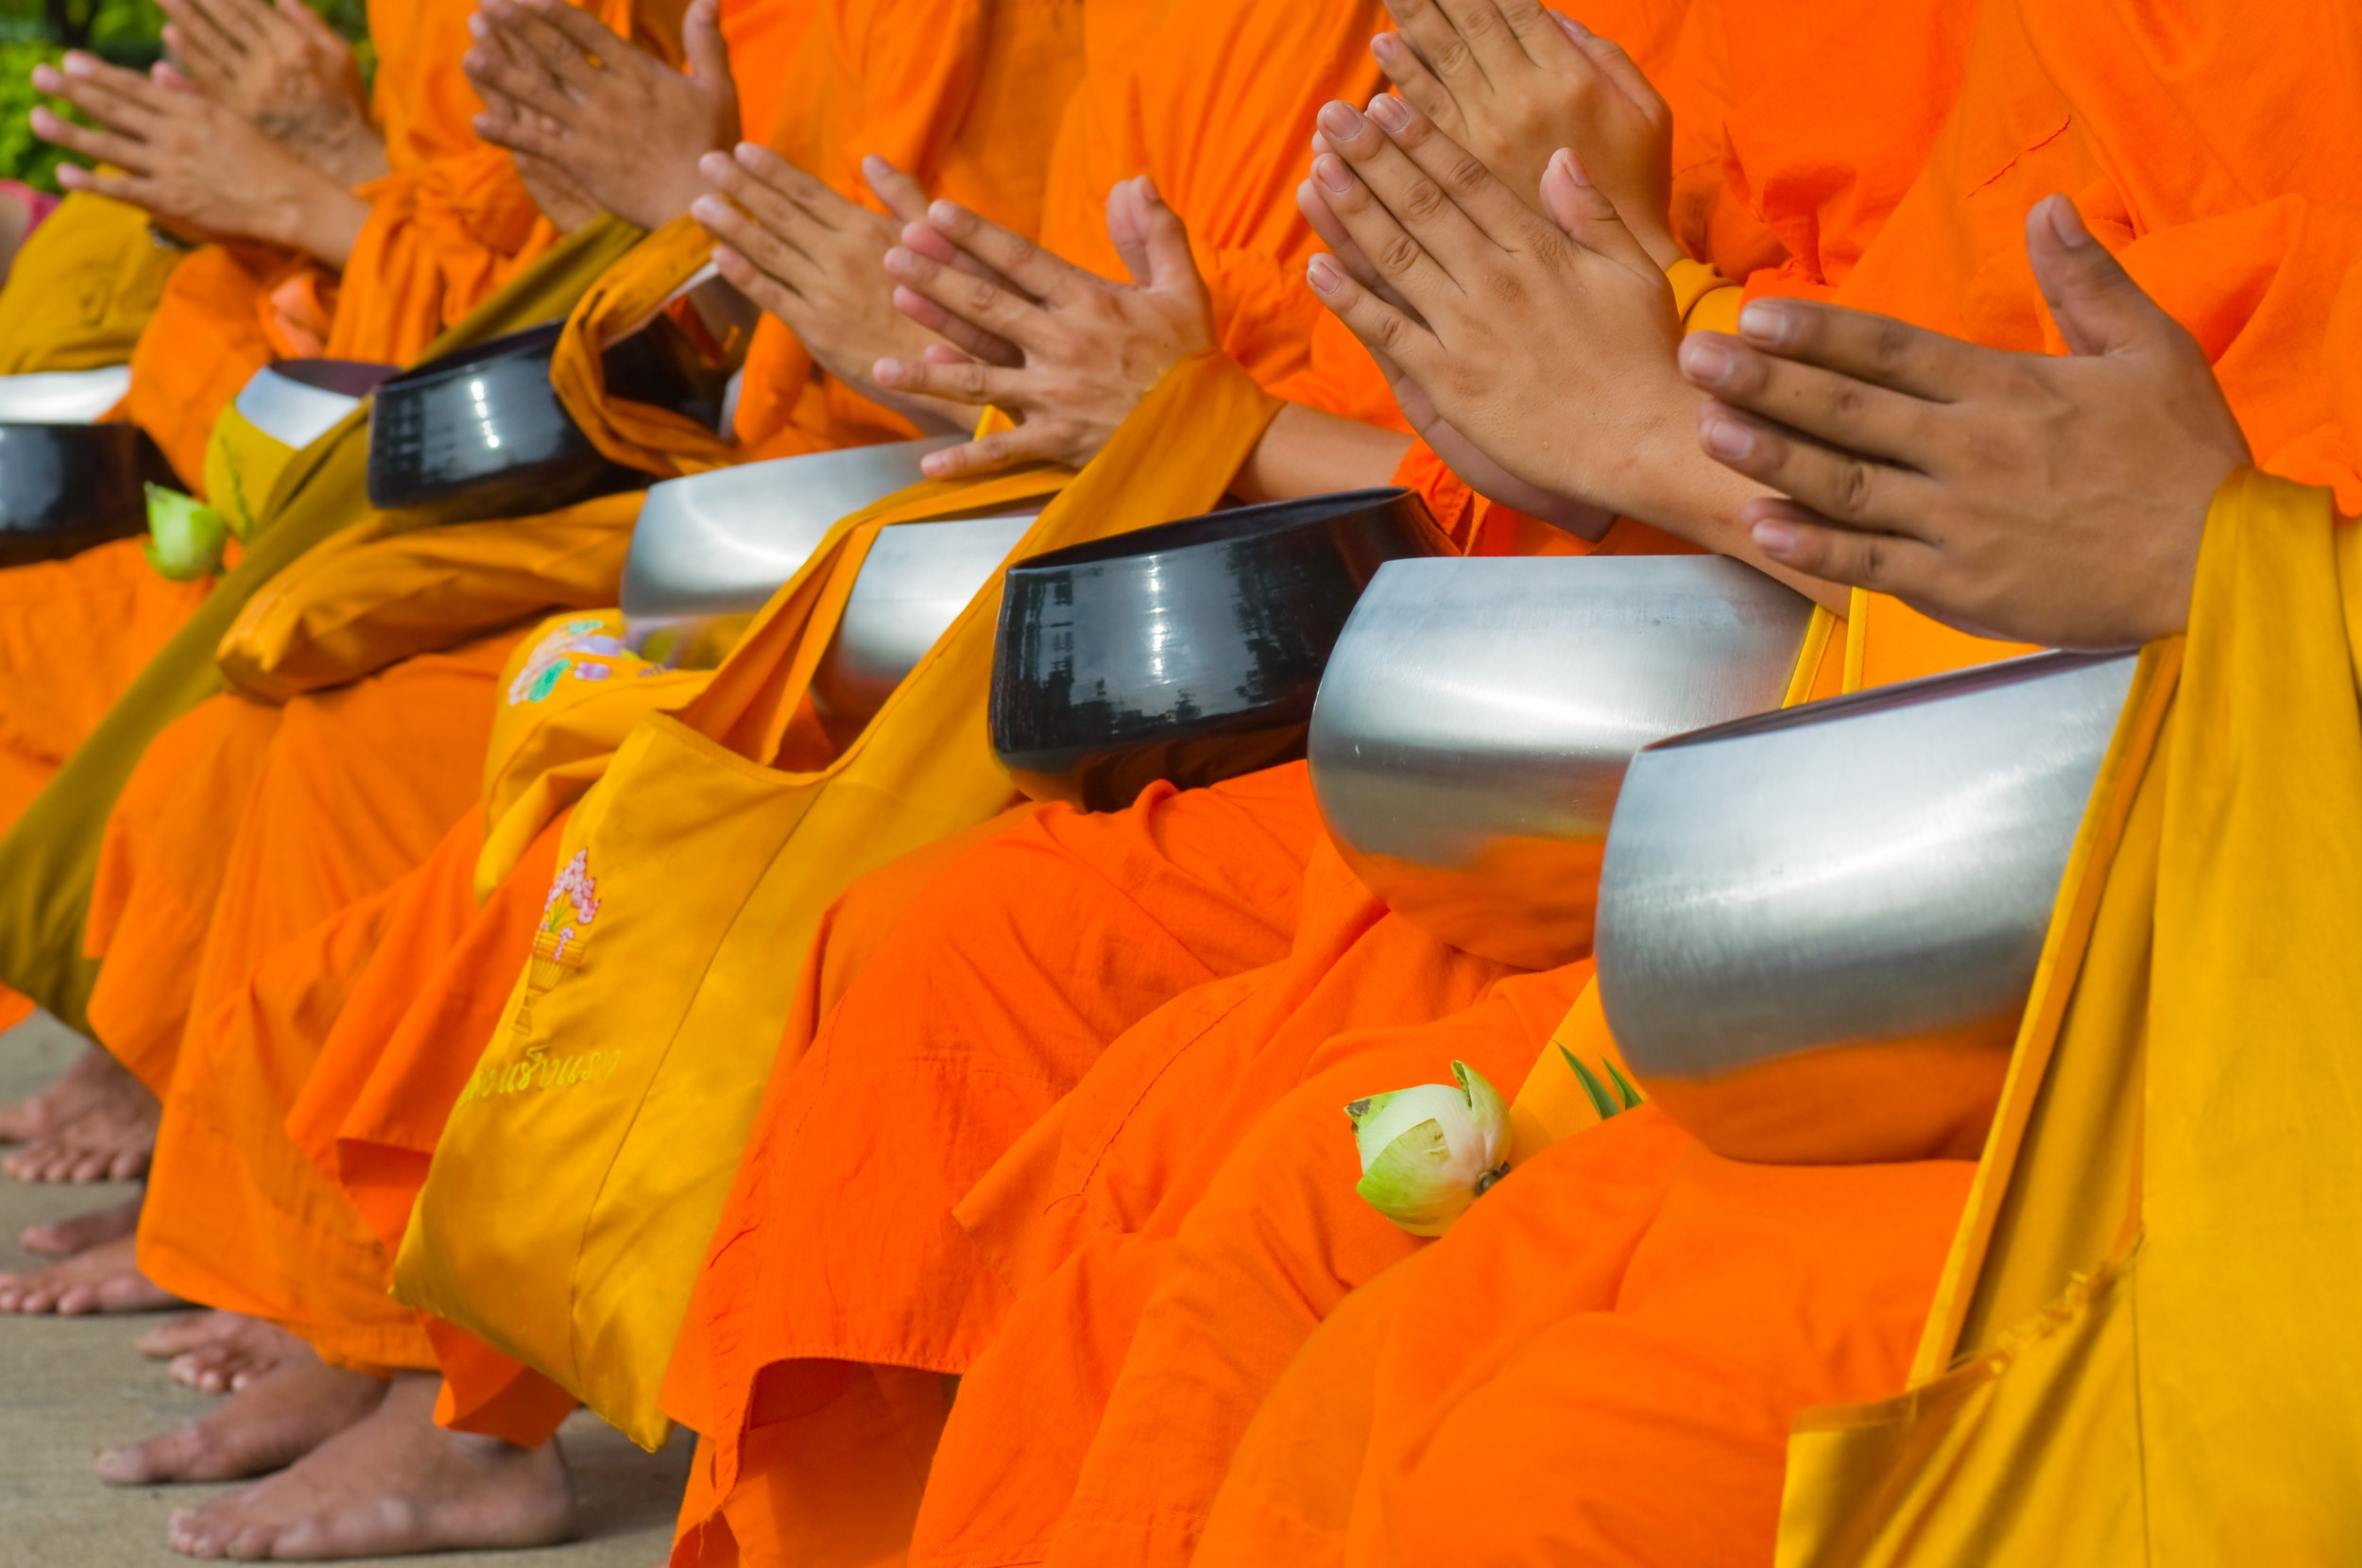 Monks receiving alms